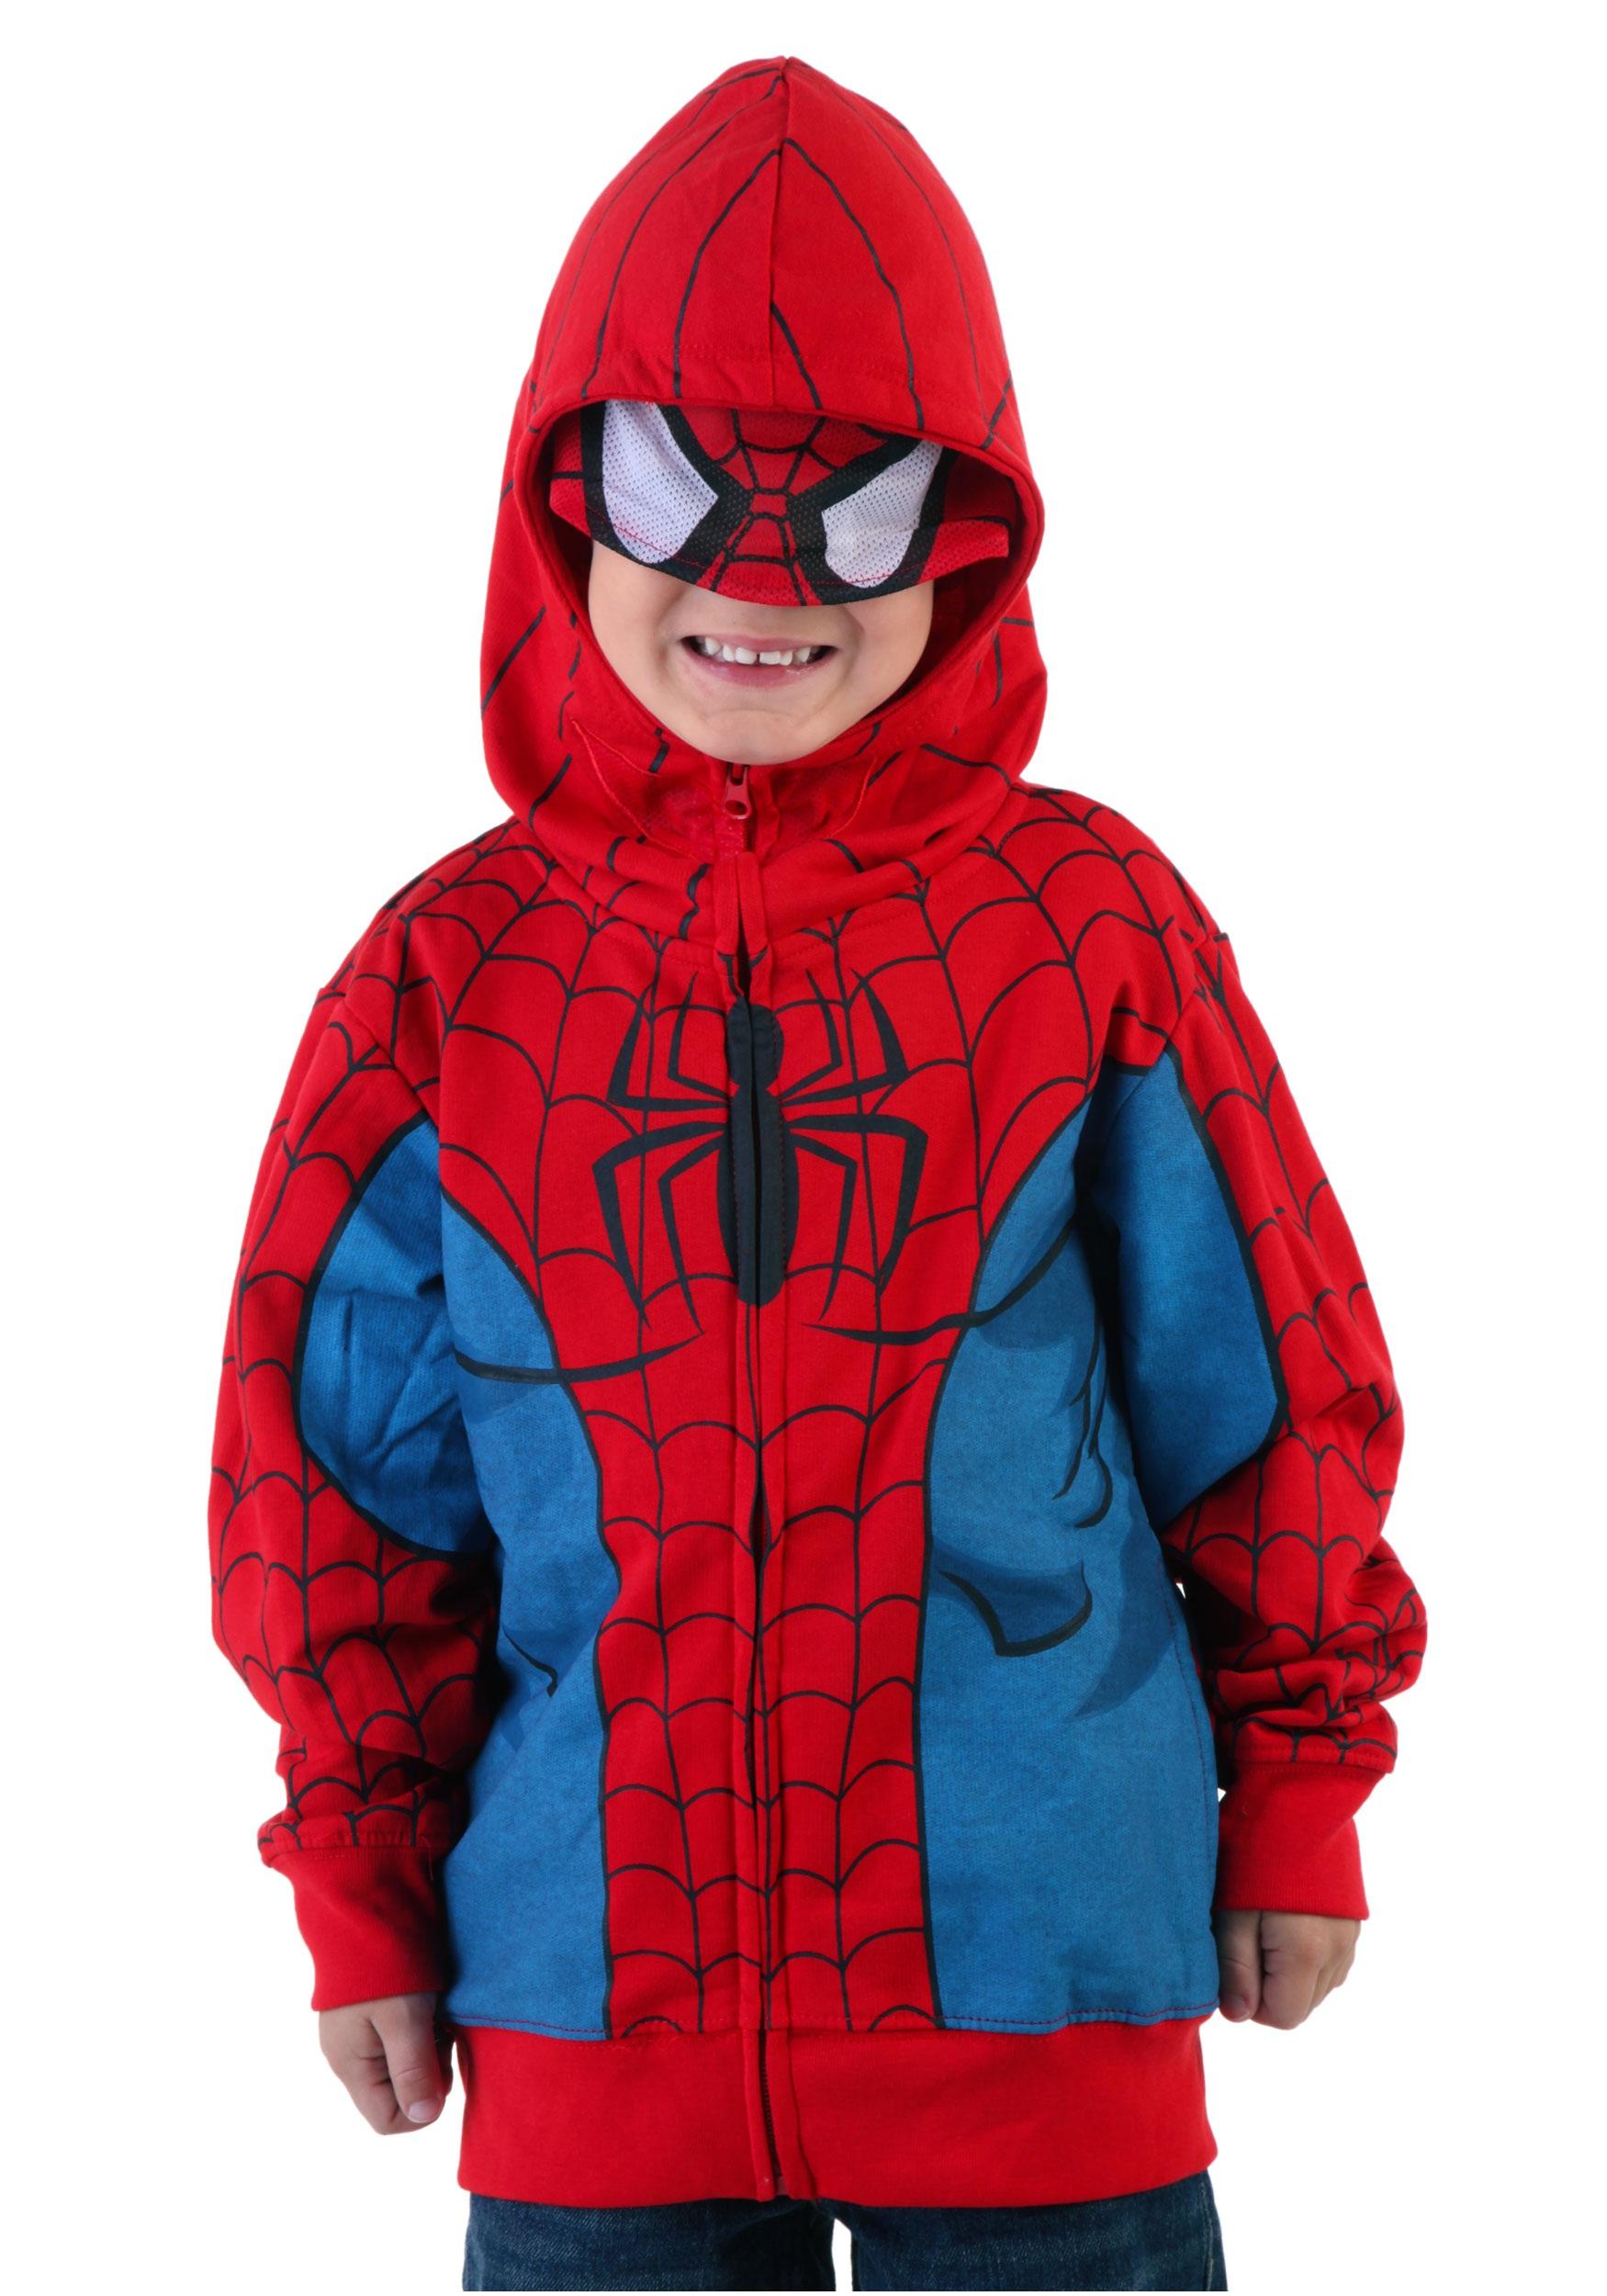 Juvenile Spider-Man Costume Hoodie - Halloween Costumes